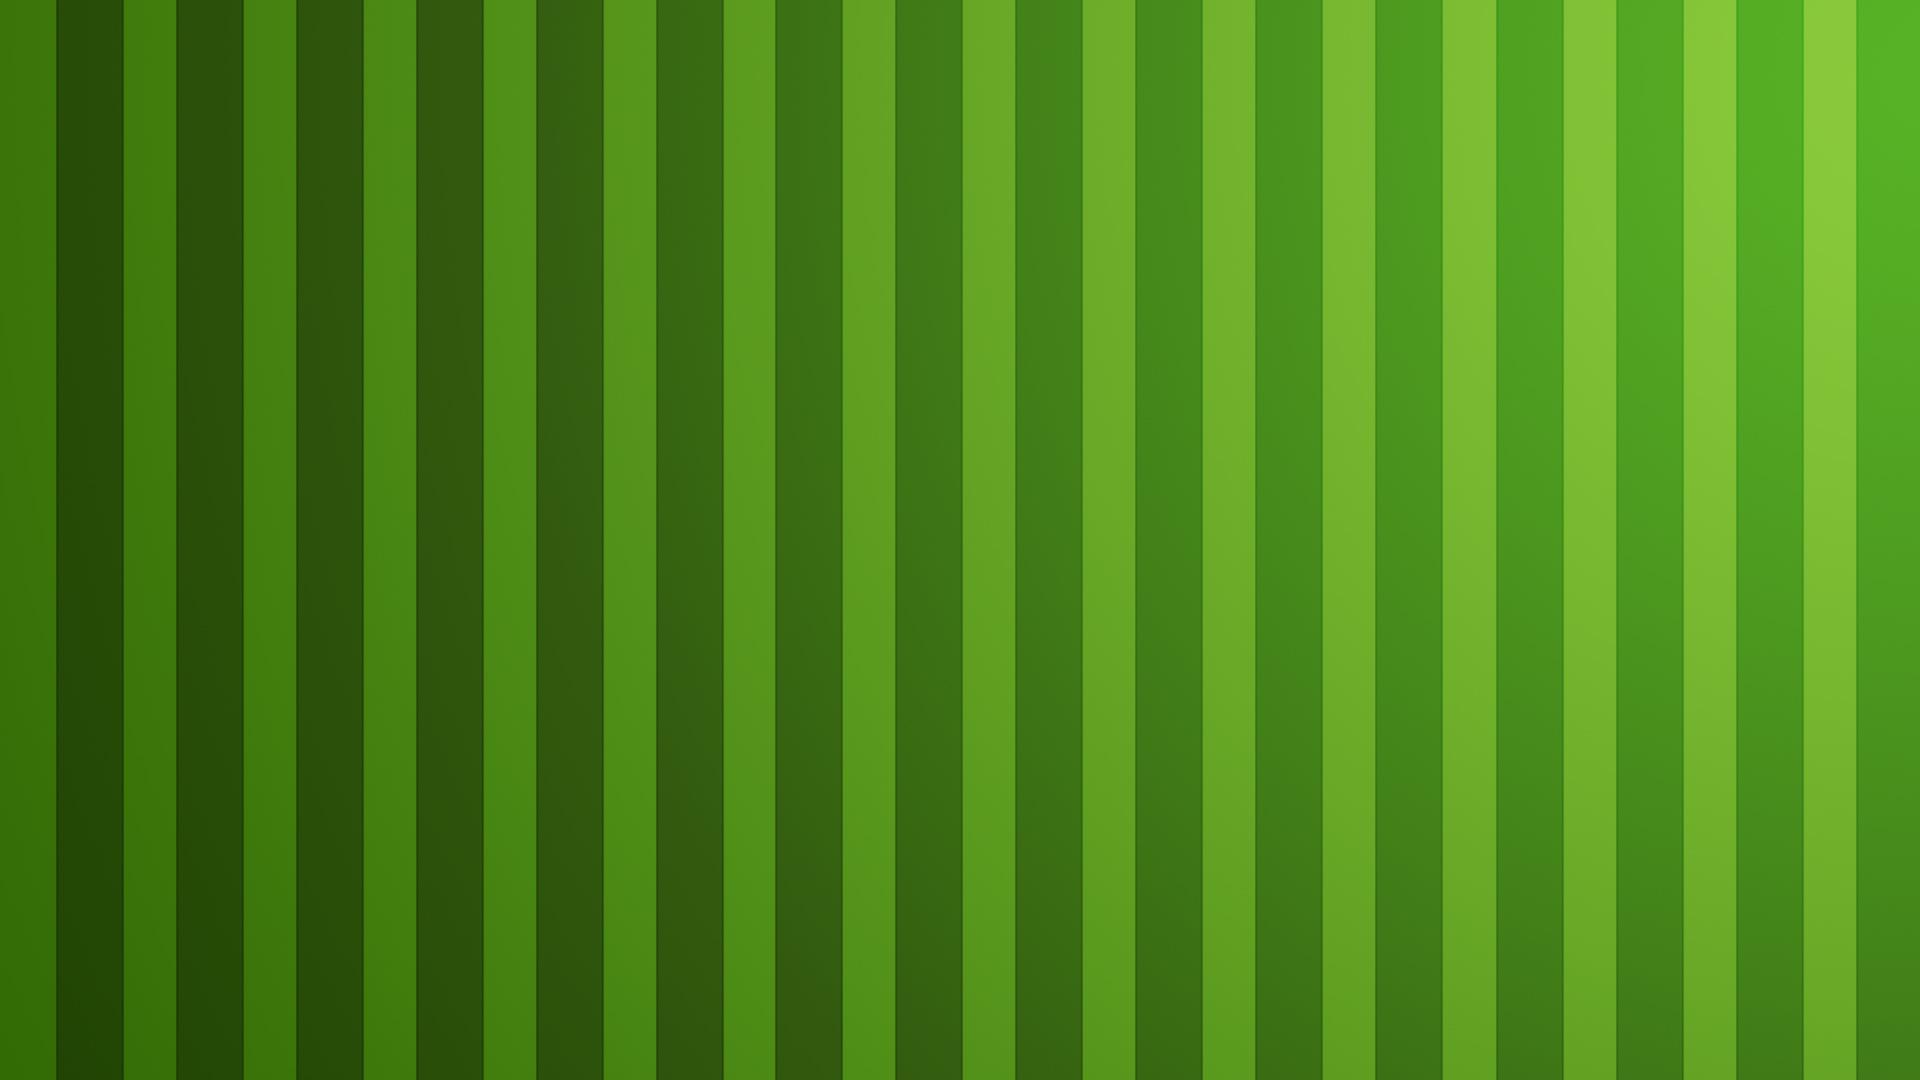 Dark Wallpaper Hd 1920x1080 Page Full Hd P Green Wallpapers Hd Desktop Backgrounds